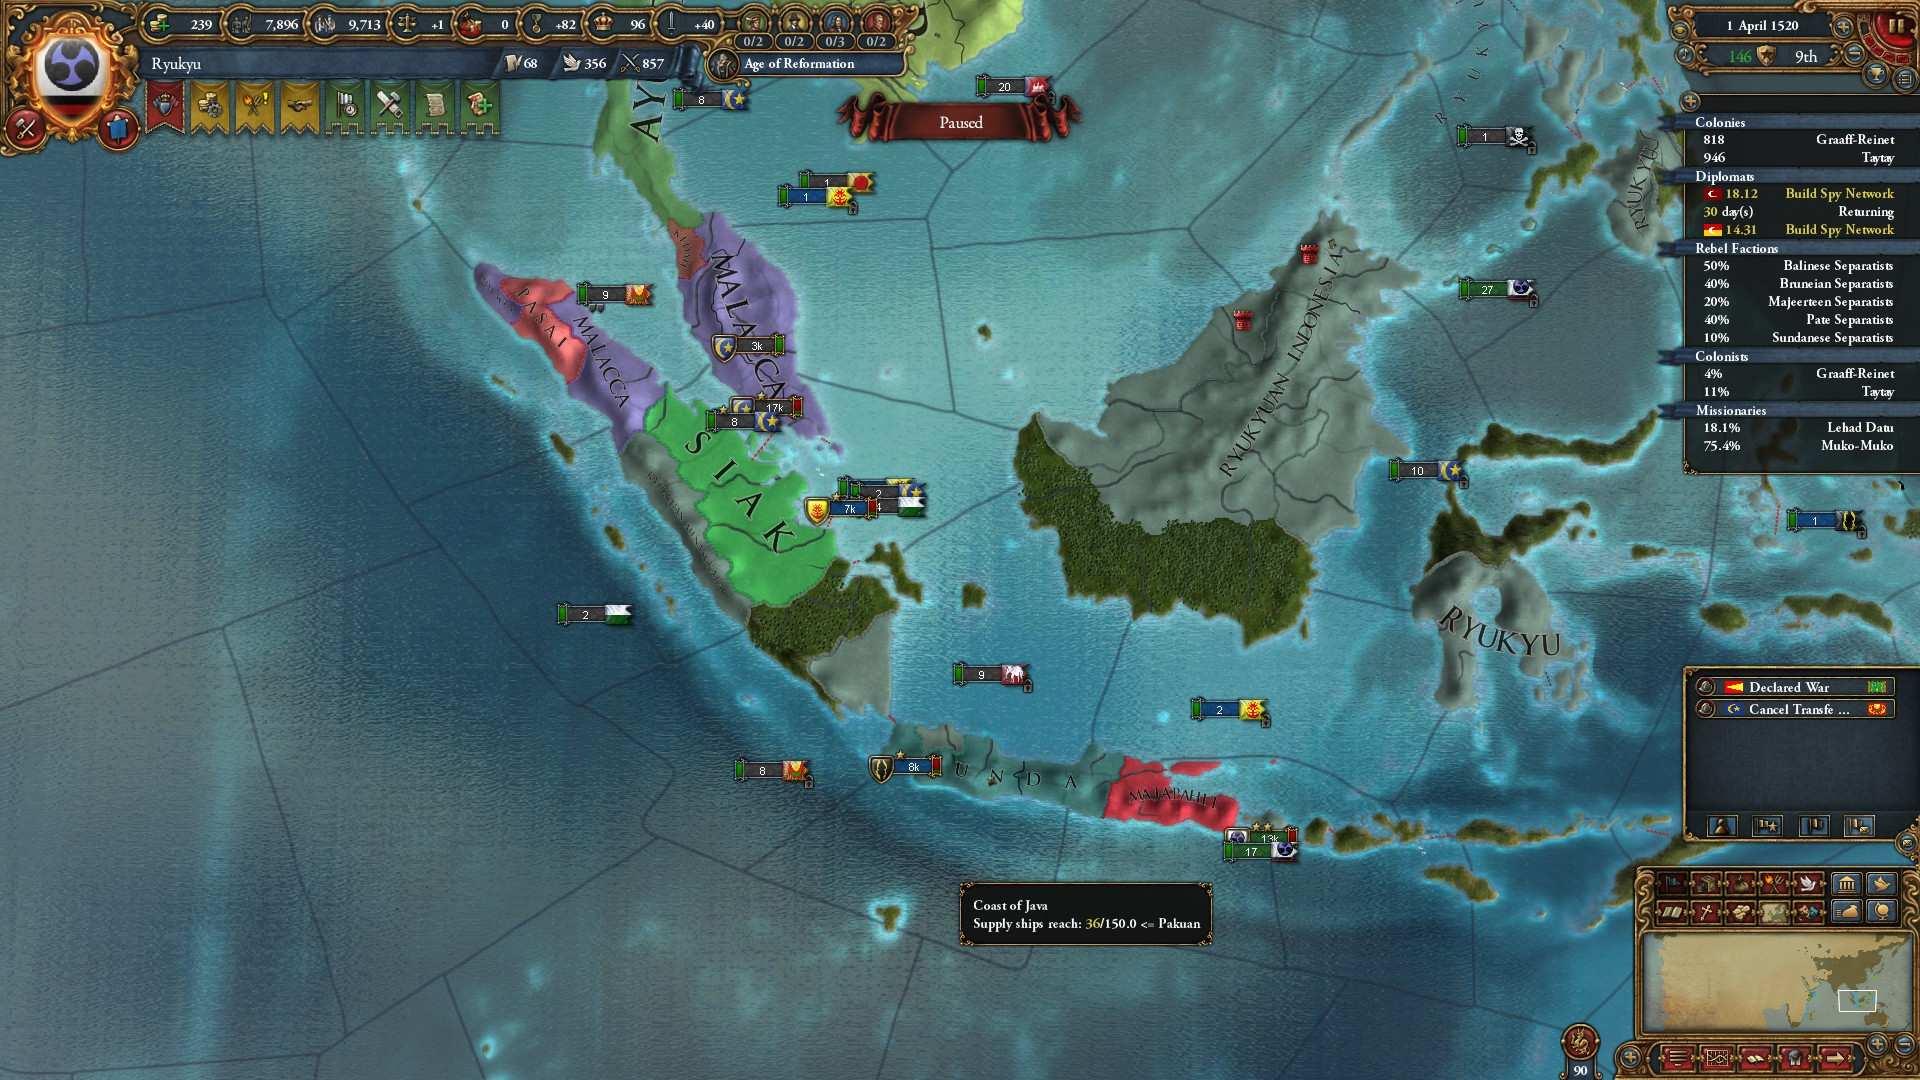 Europa Universalis IV - How to Get the Three Mountains